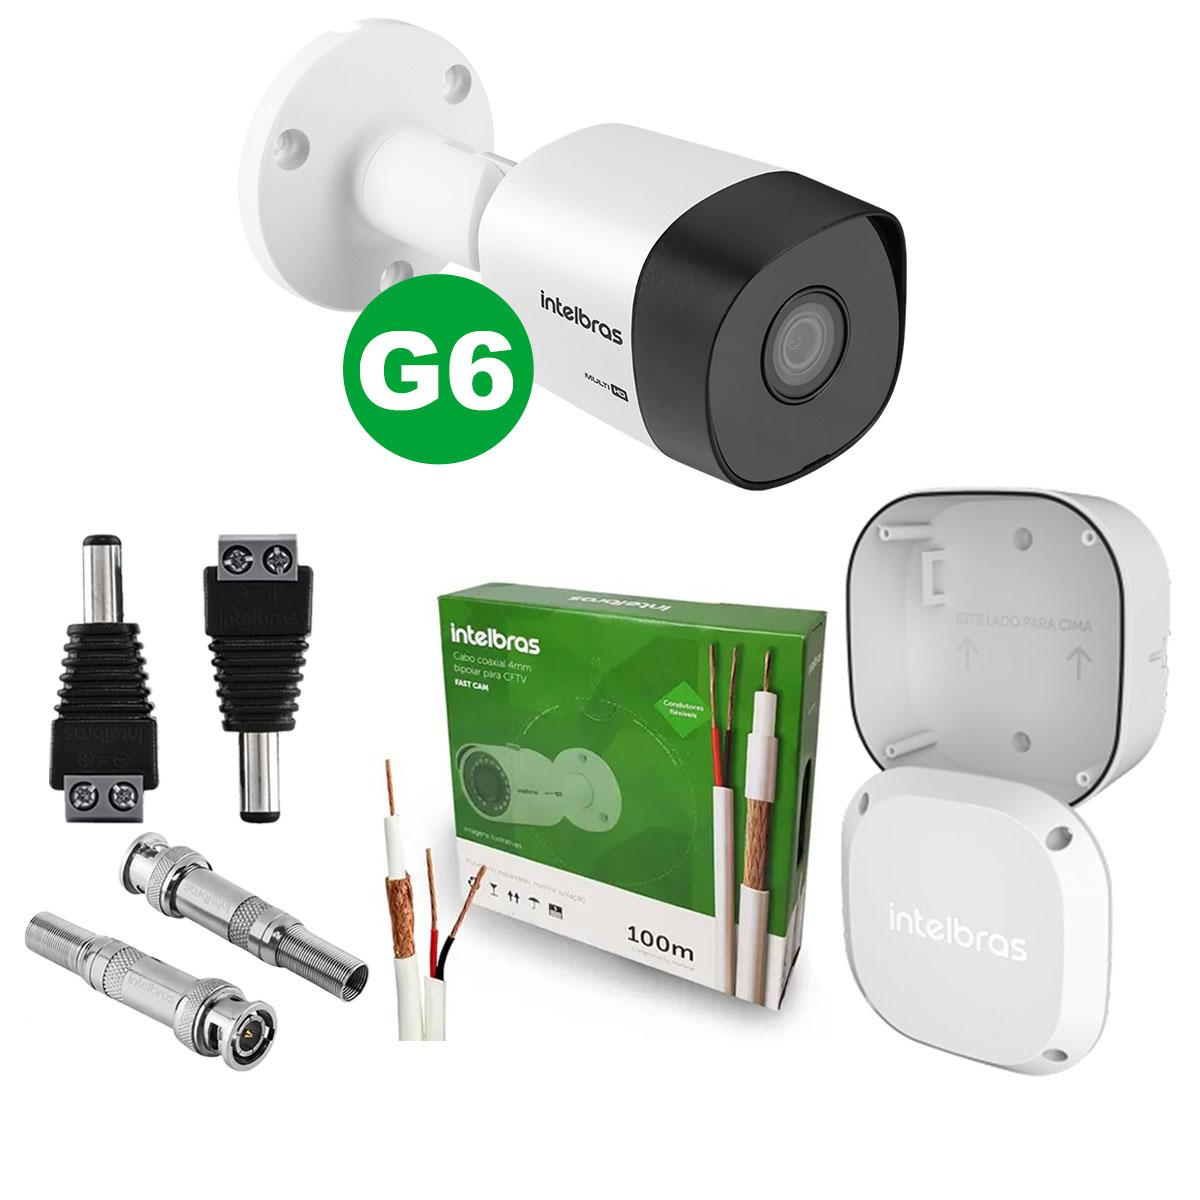 Kit Câmera Bullet Intelbras Vhd 3130 B G6 3,6mm + Cabo + Acessórios